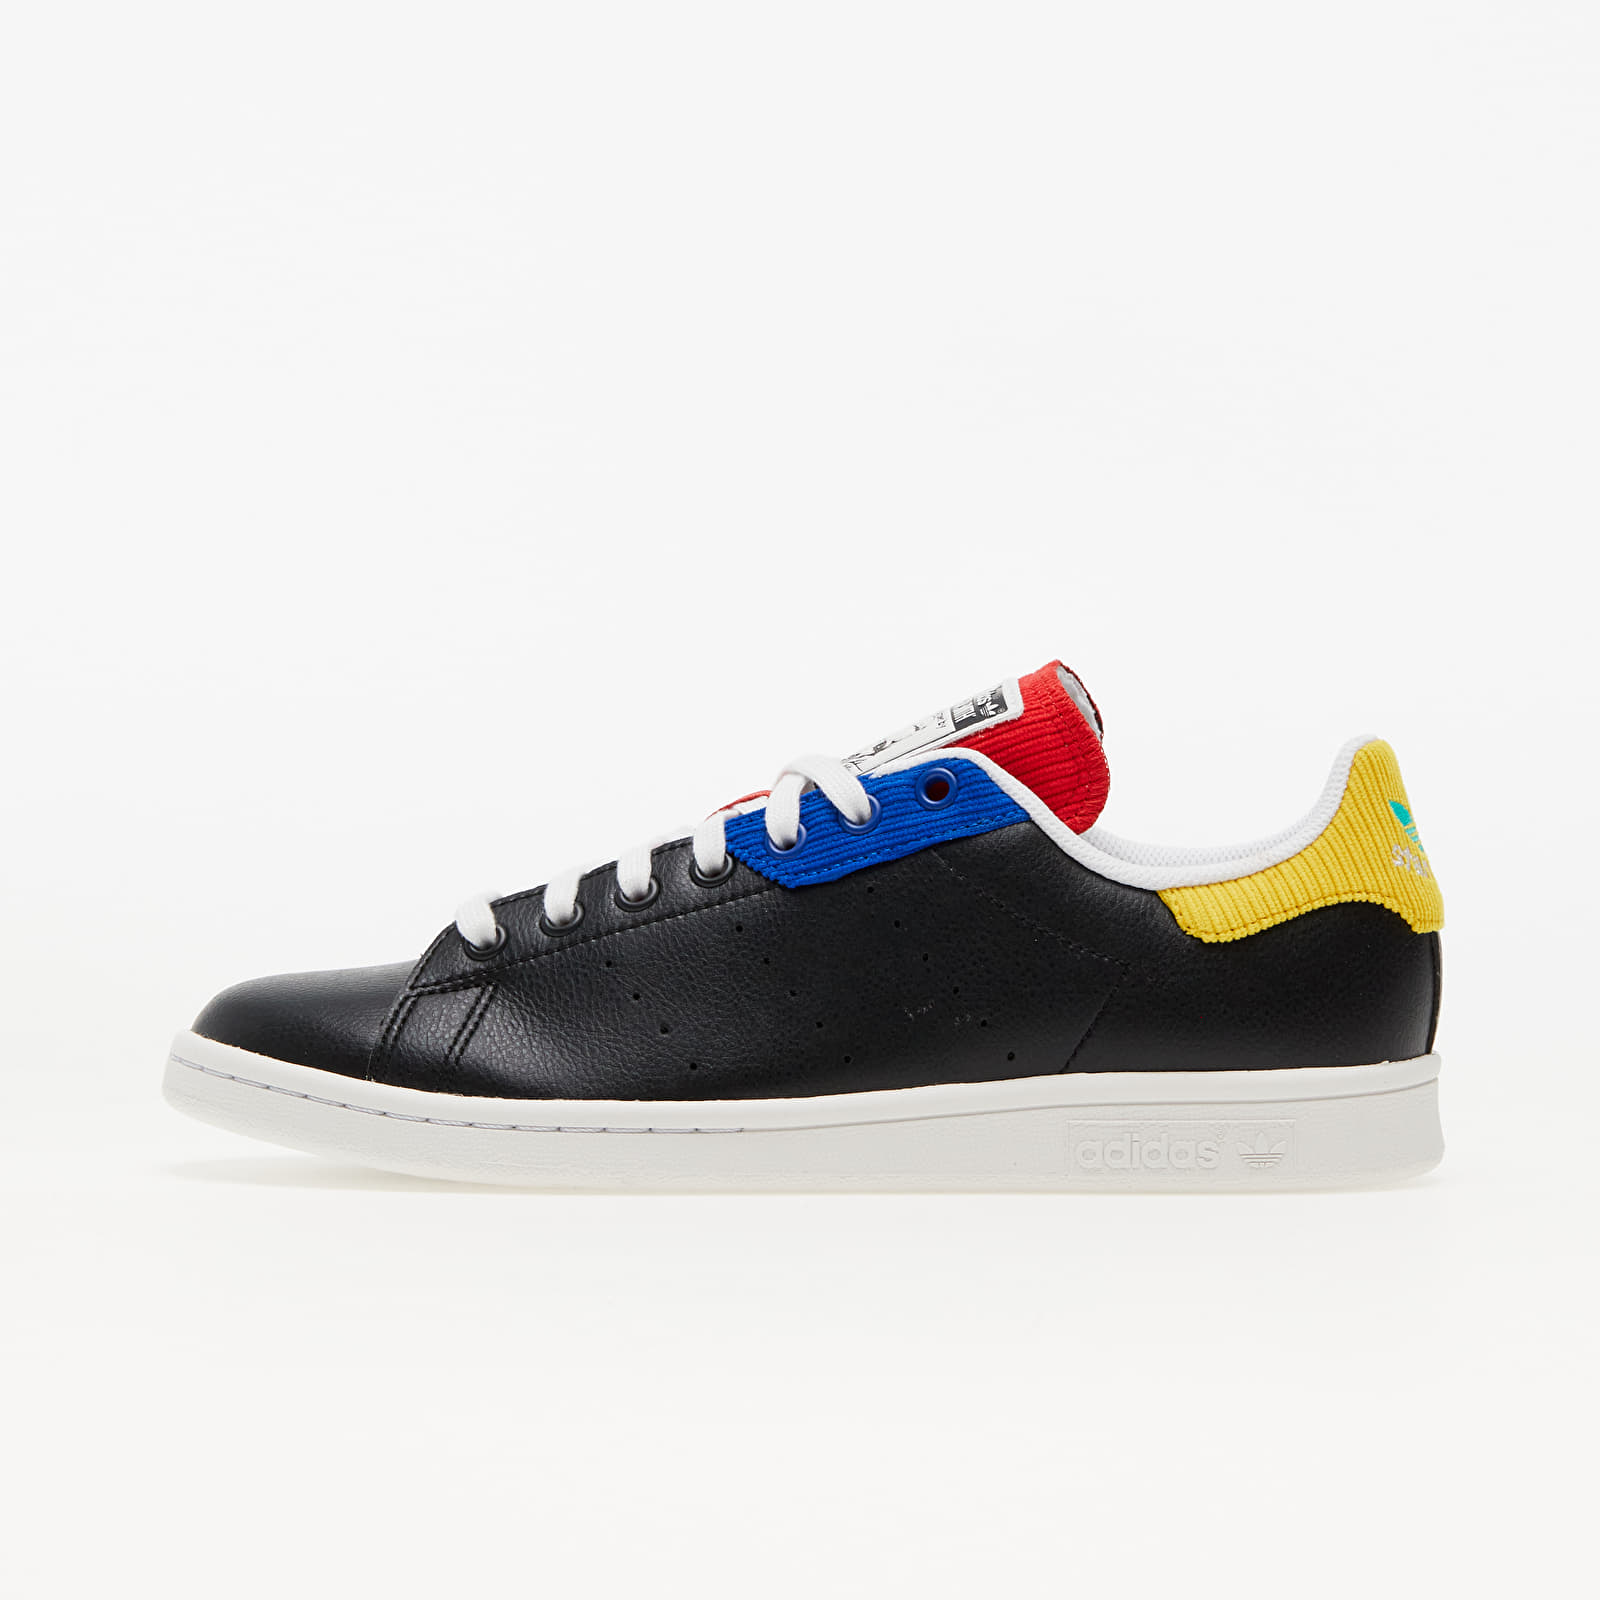 adidas Stan Smith Core Black/ Crystal White/ Royal Blue EUR 41 1/3